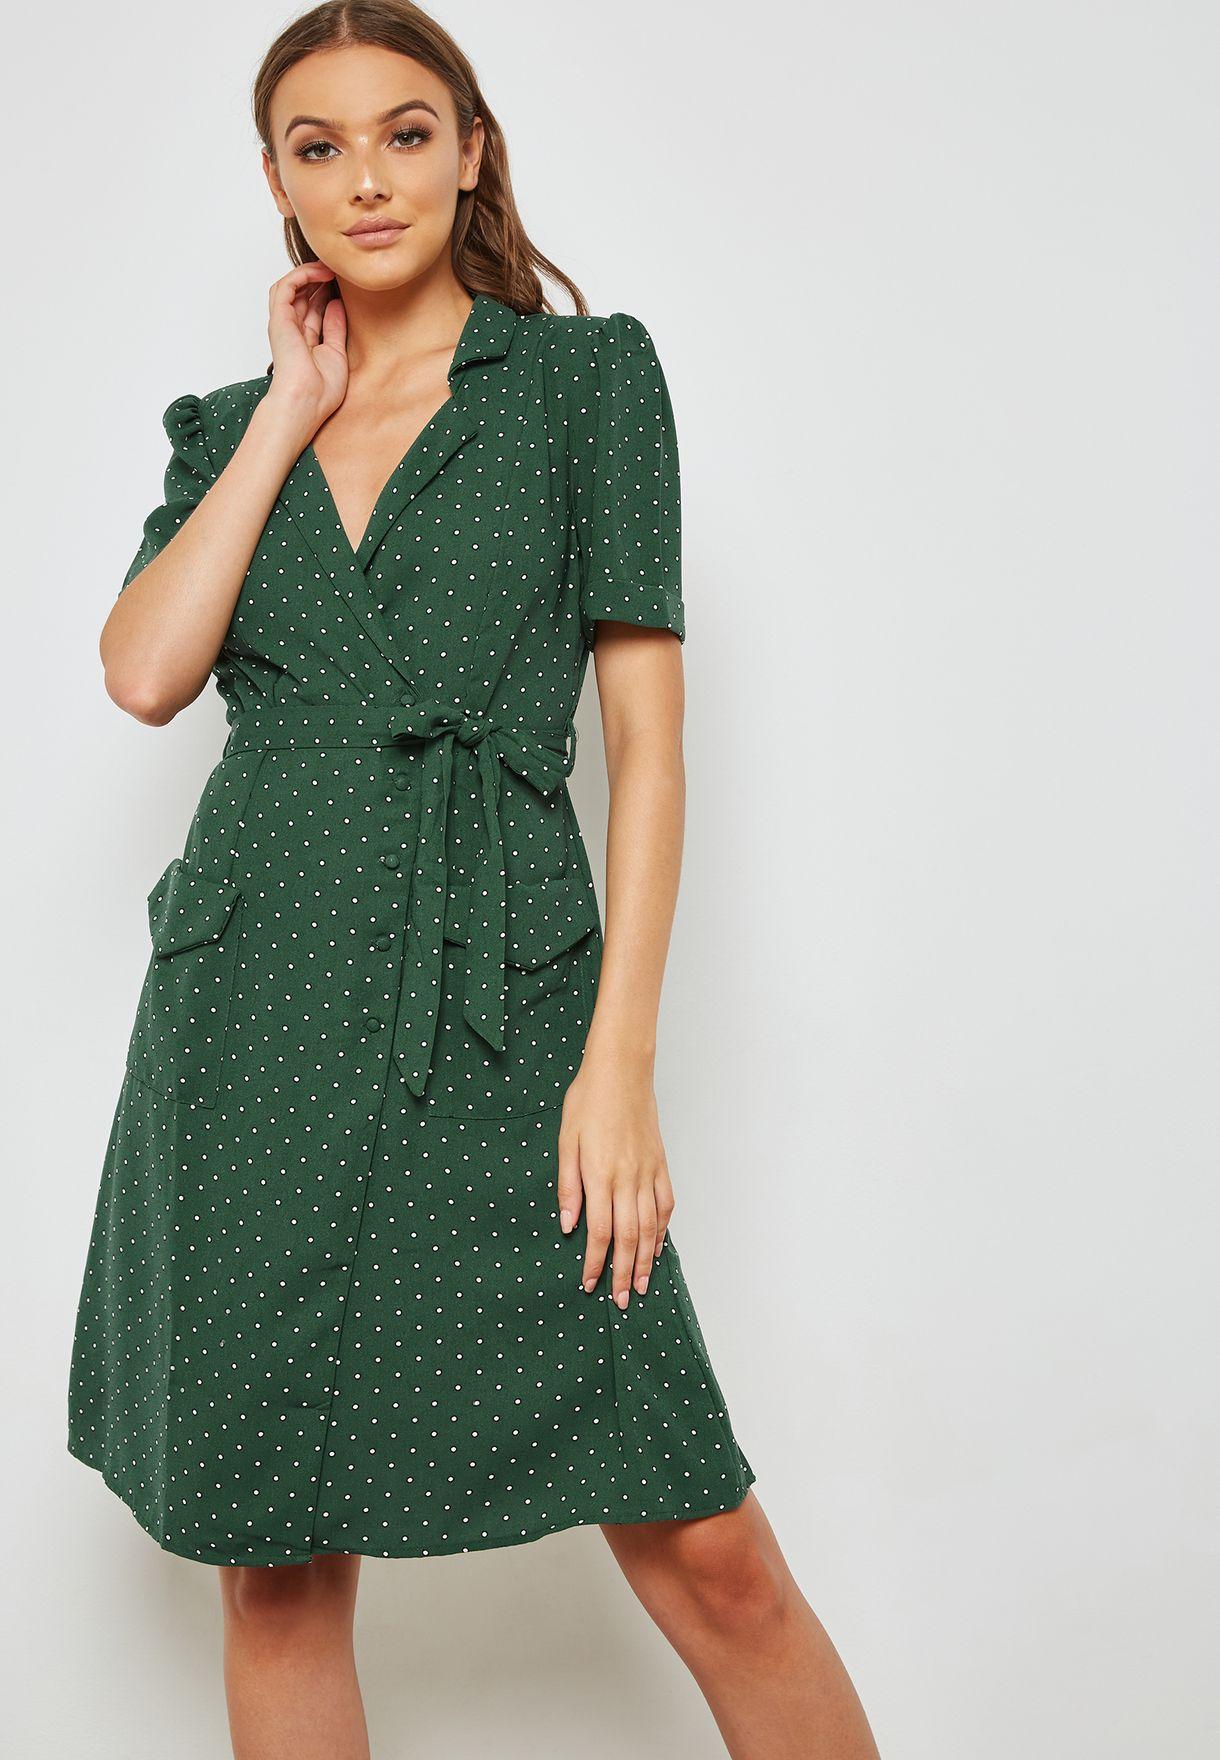 250e218b45c Shop Mango prints Polka Dot Wrap Dress 33033793 for Women in UAE ...